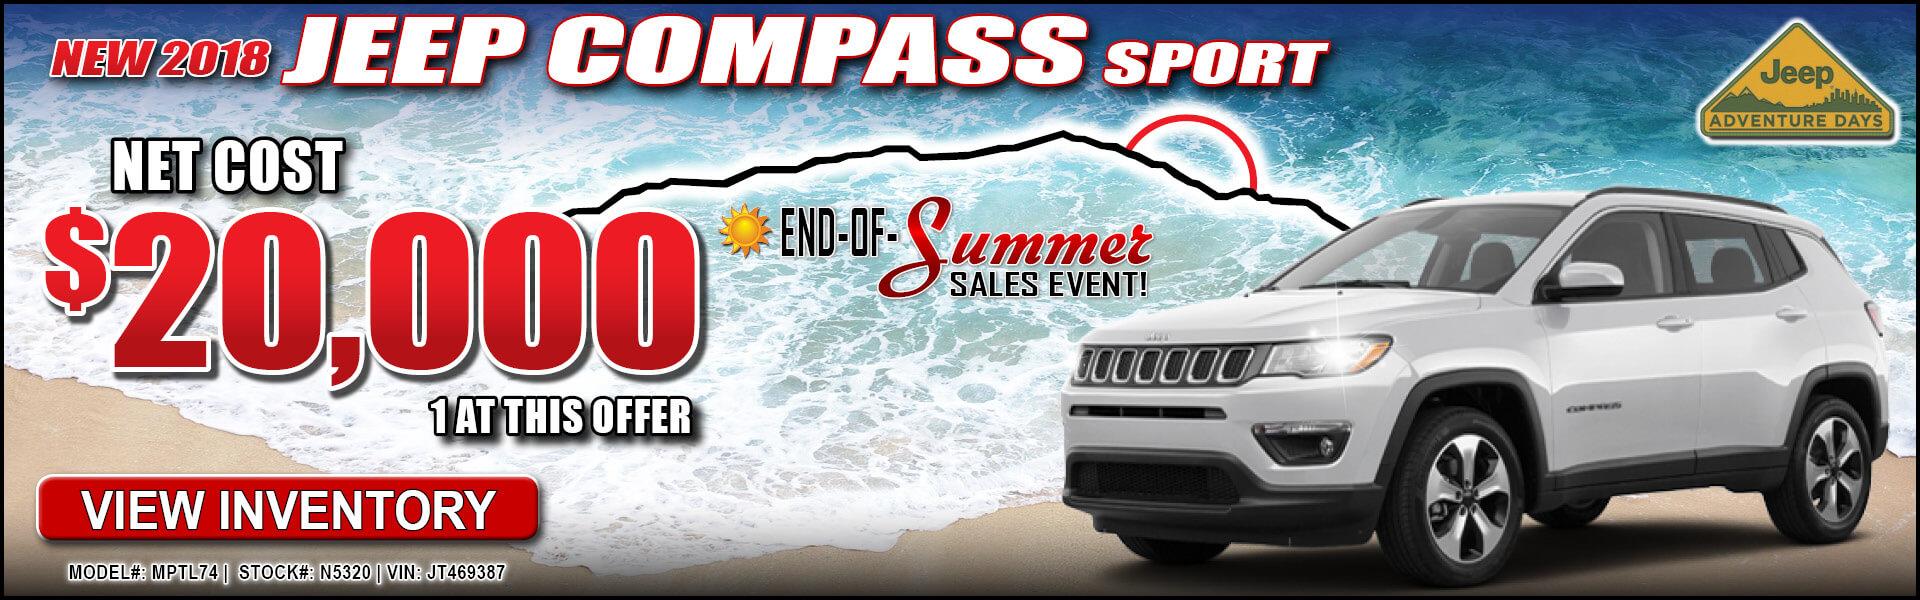 Jeep Compass $20,000